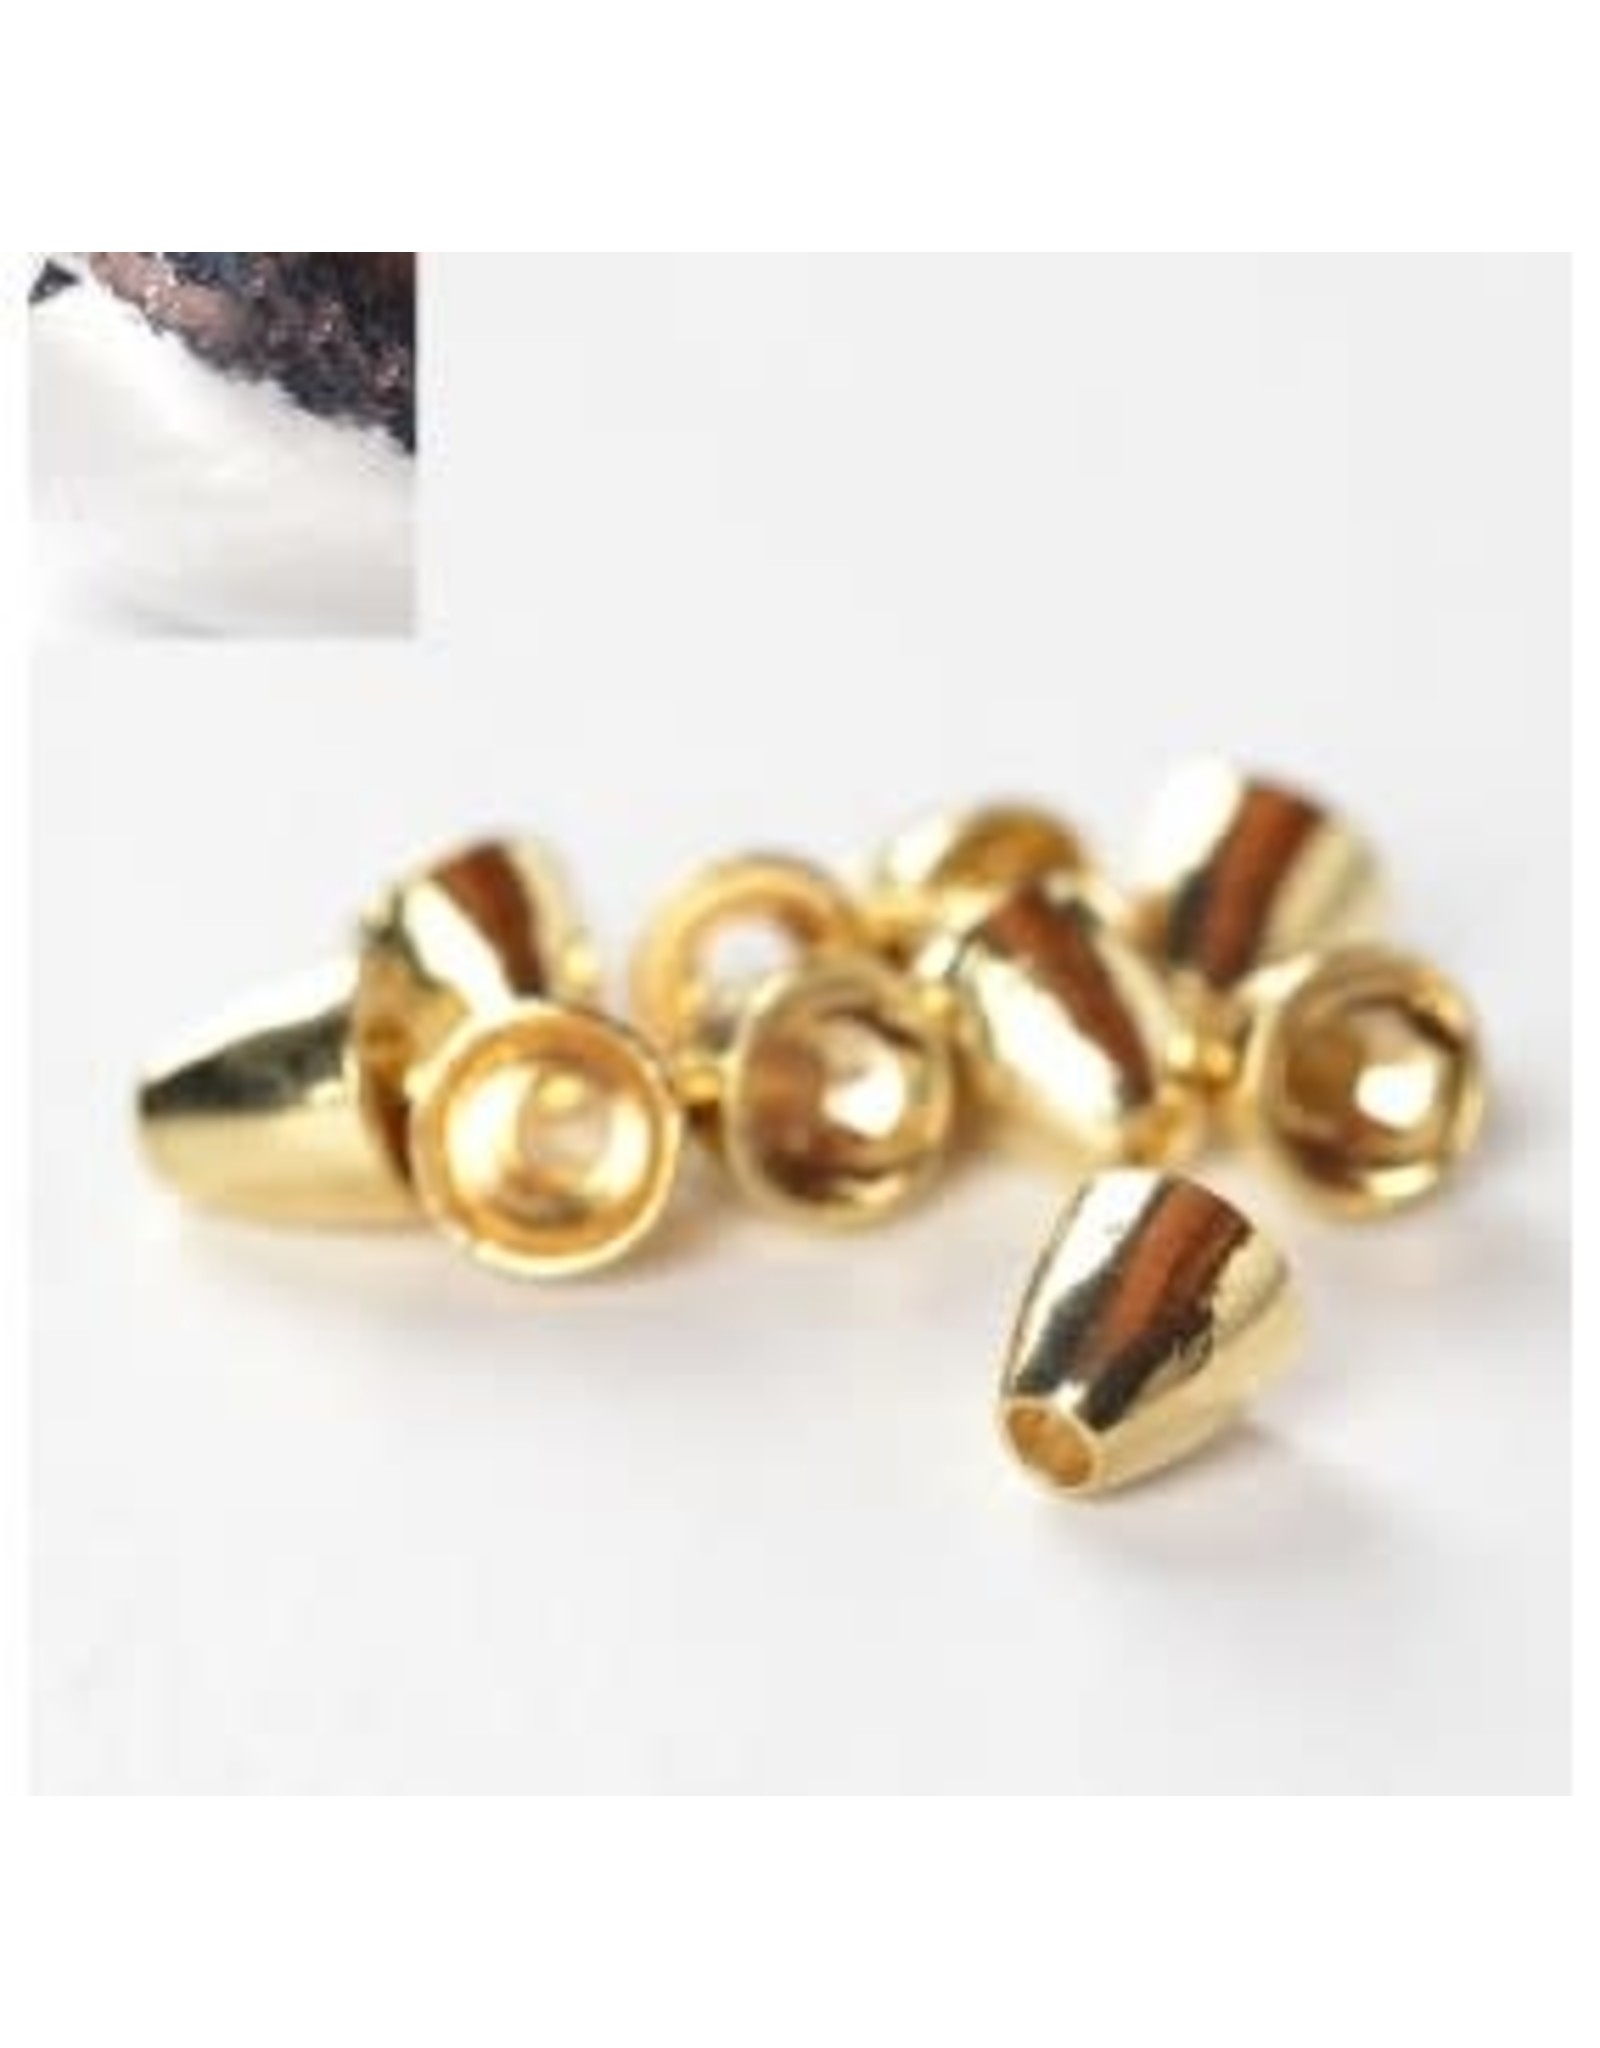 Perfect Hatch PH Tungsten Cone Head Beads